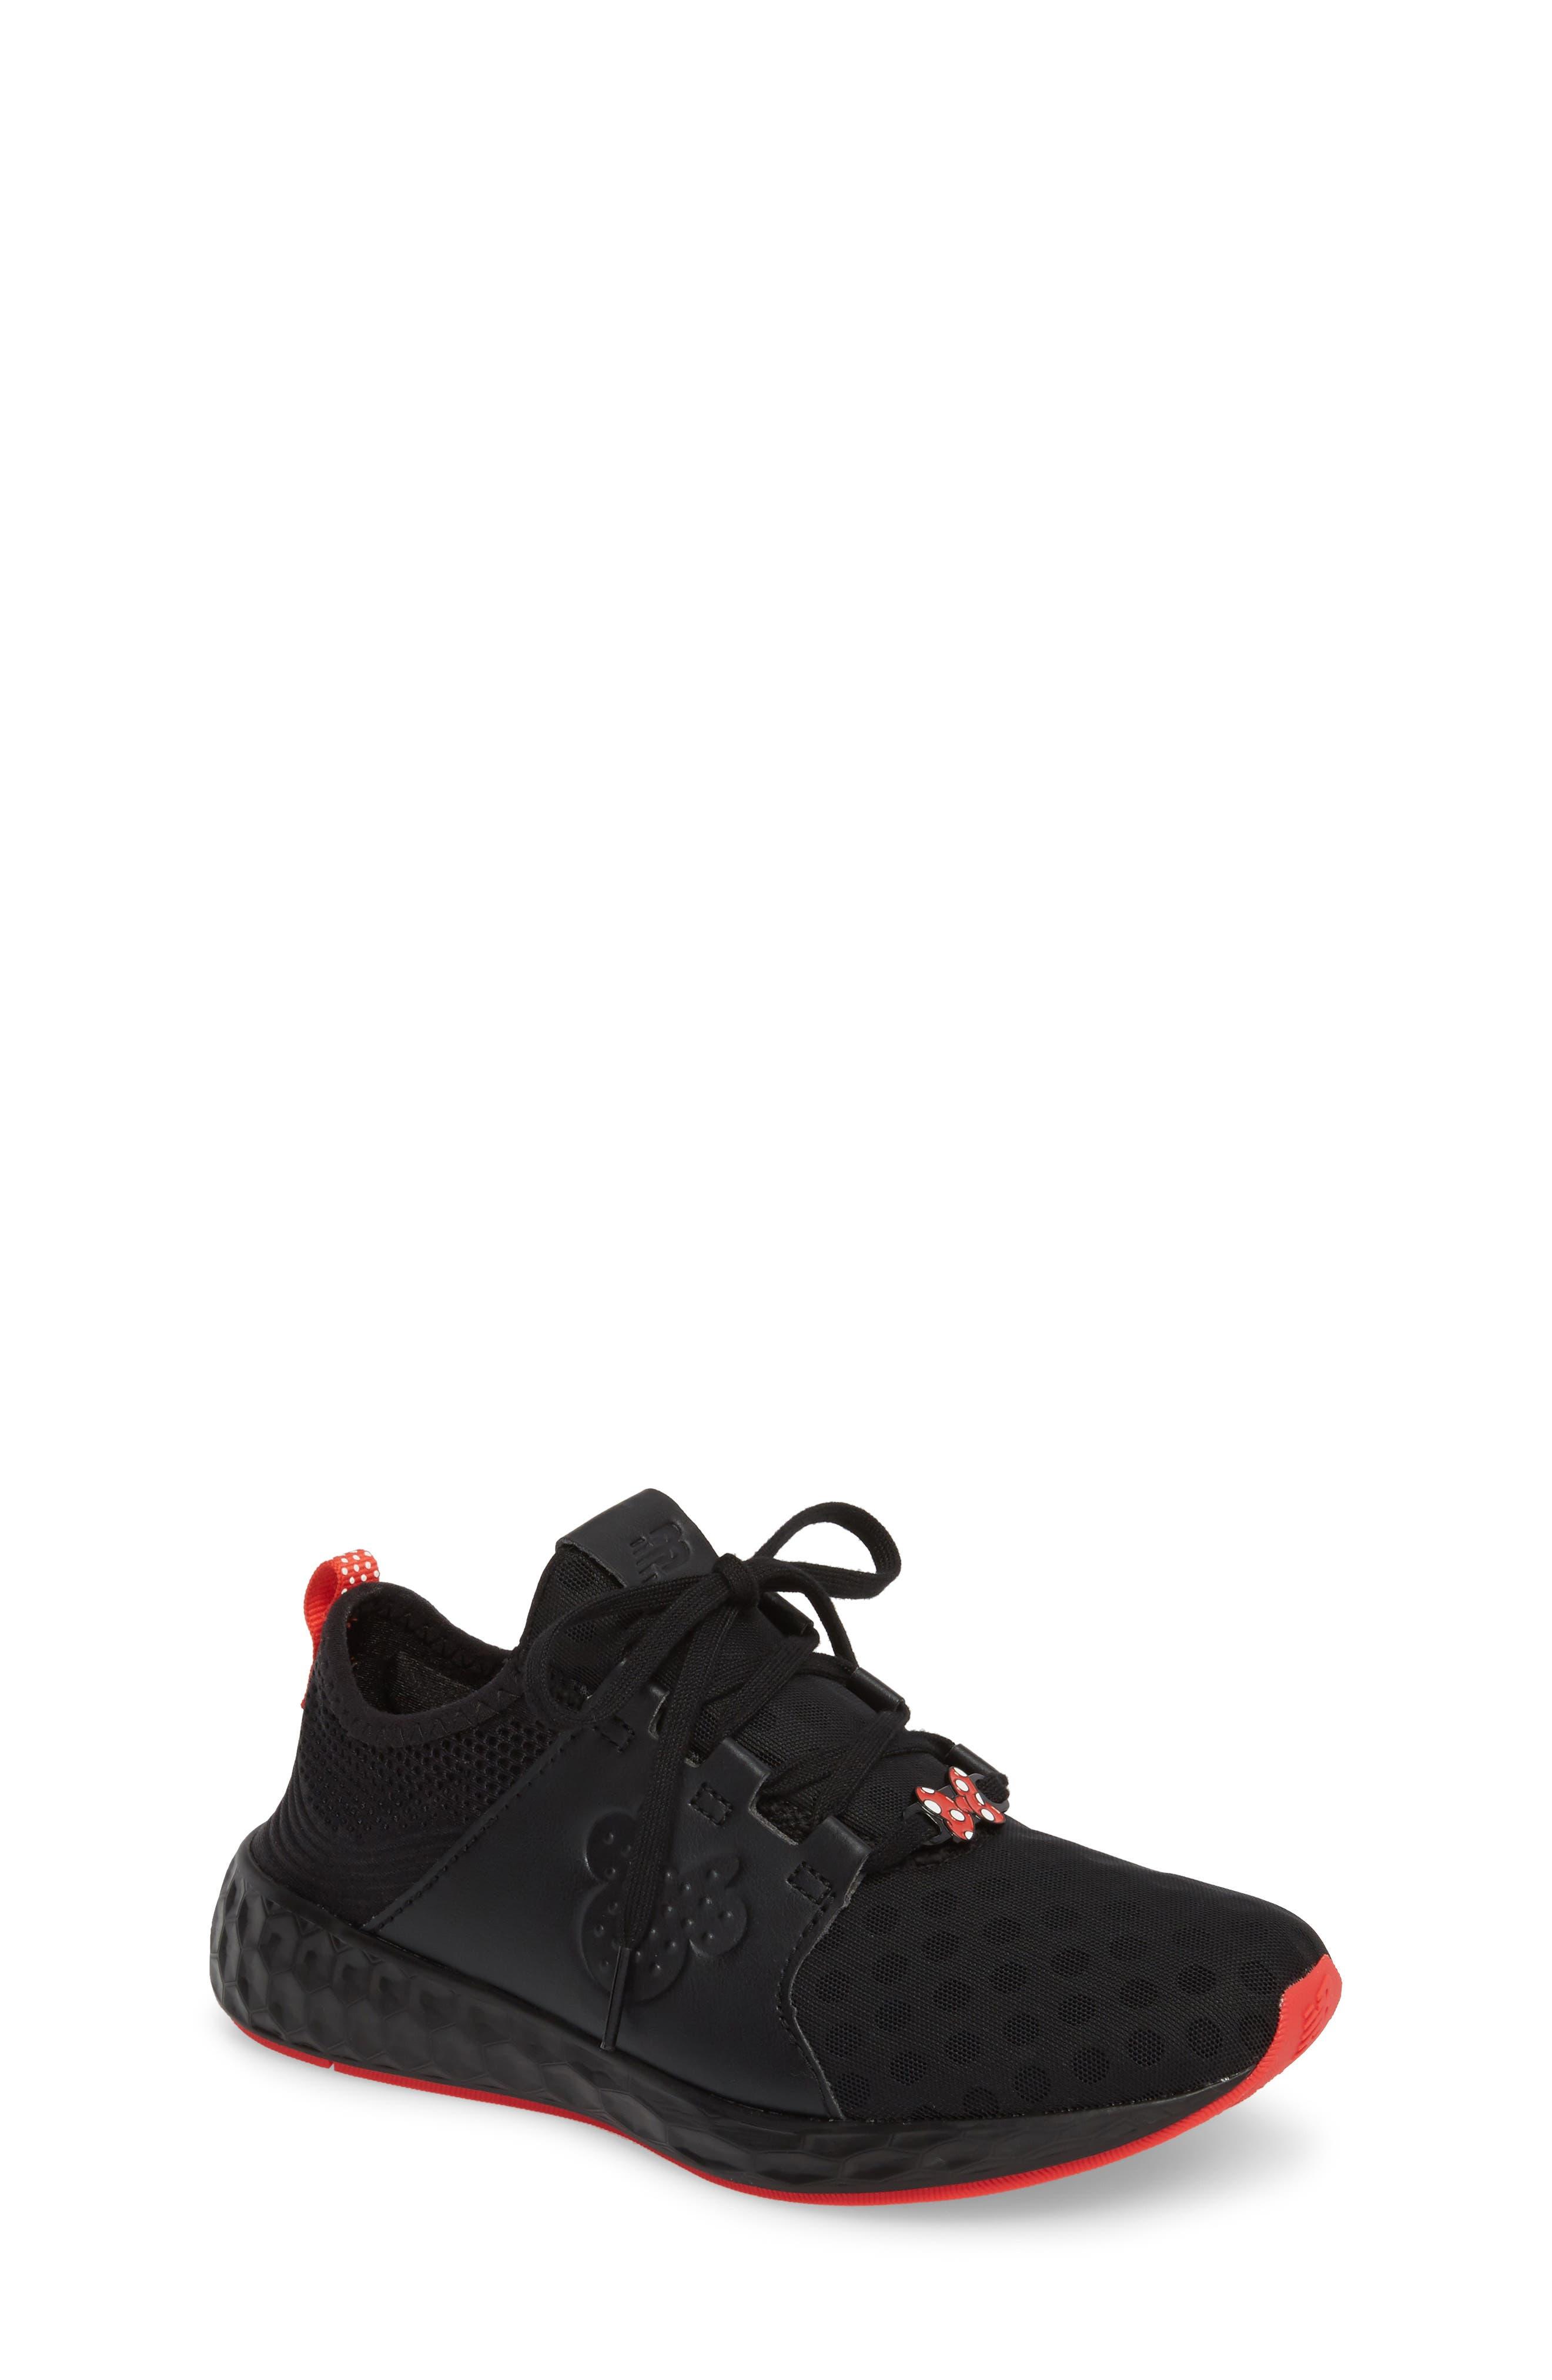 x Disney Minnie Mouse Cruz Sport Sneaker,                             Main thumbnail 1, color,                             Black/ Red